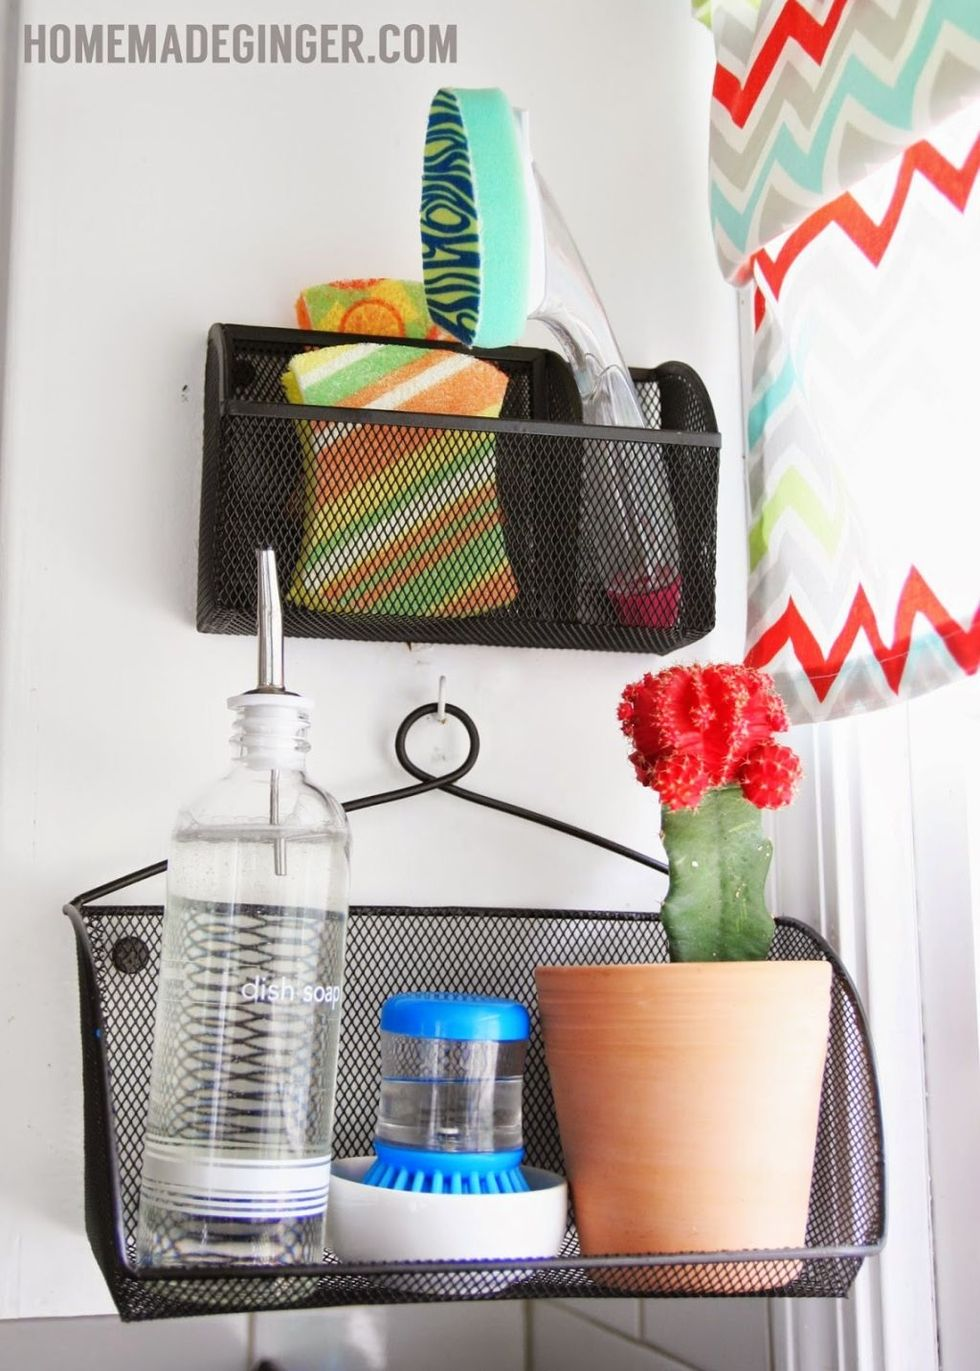 153 Repurpose Your Office Supply Organizers via simphome